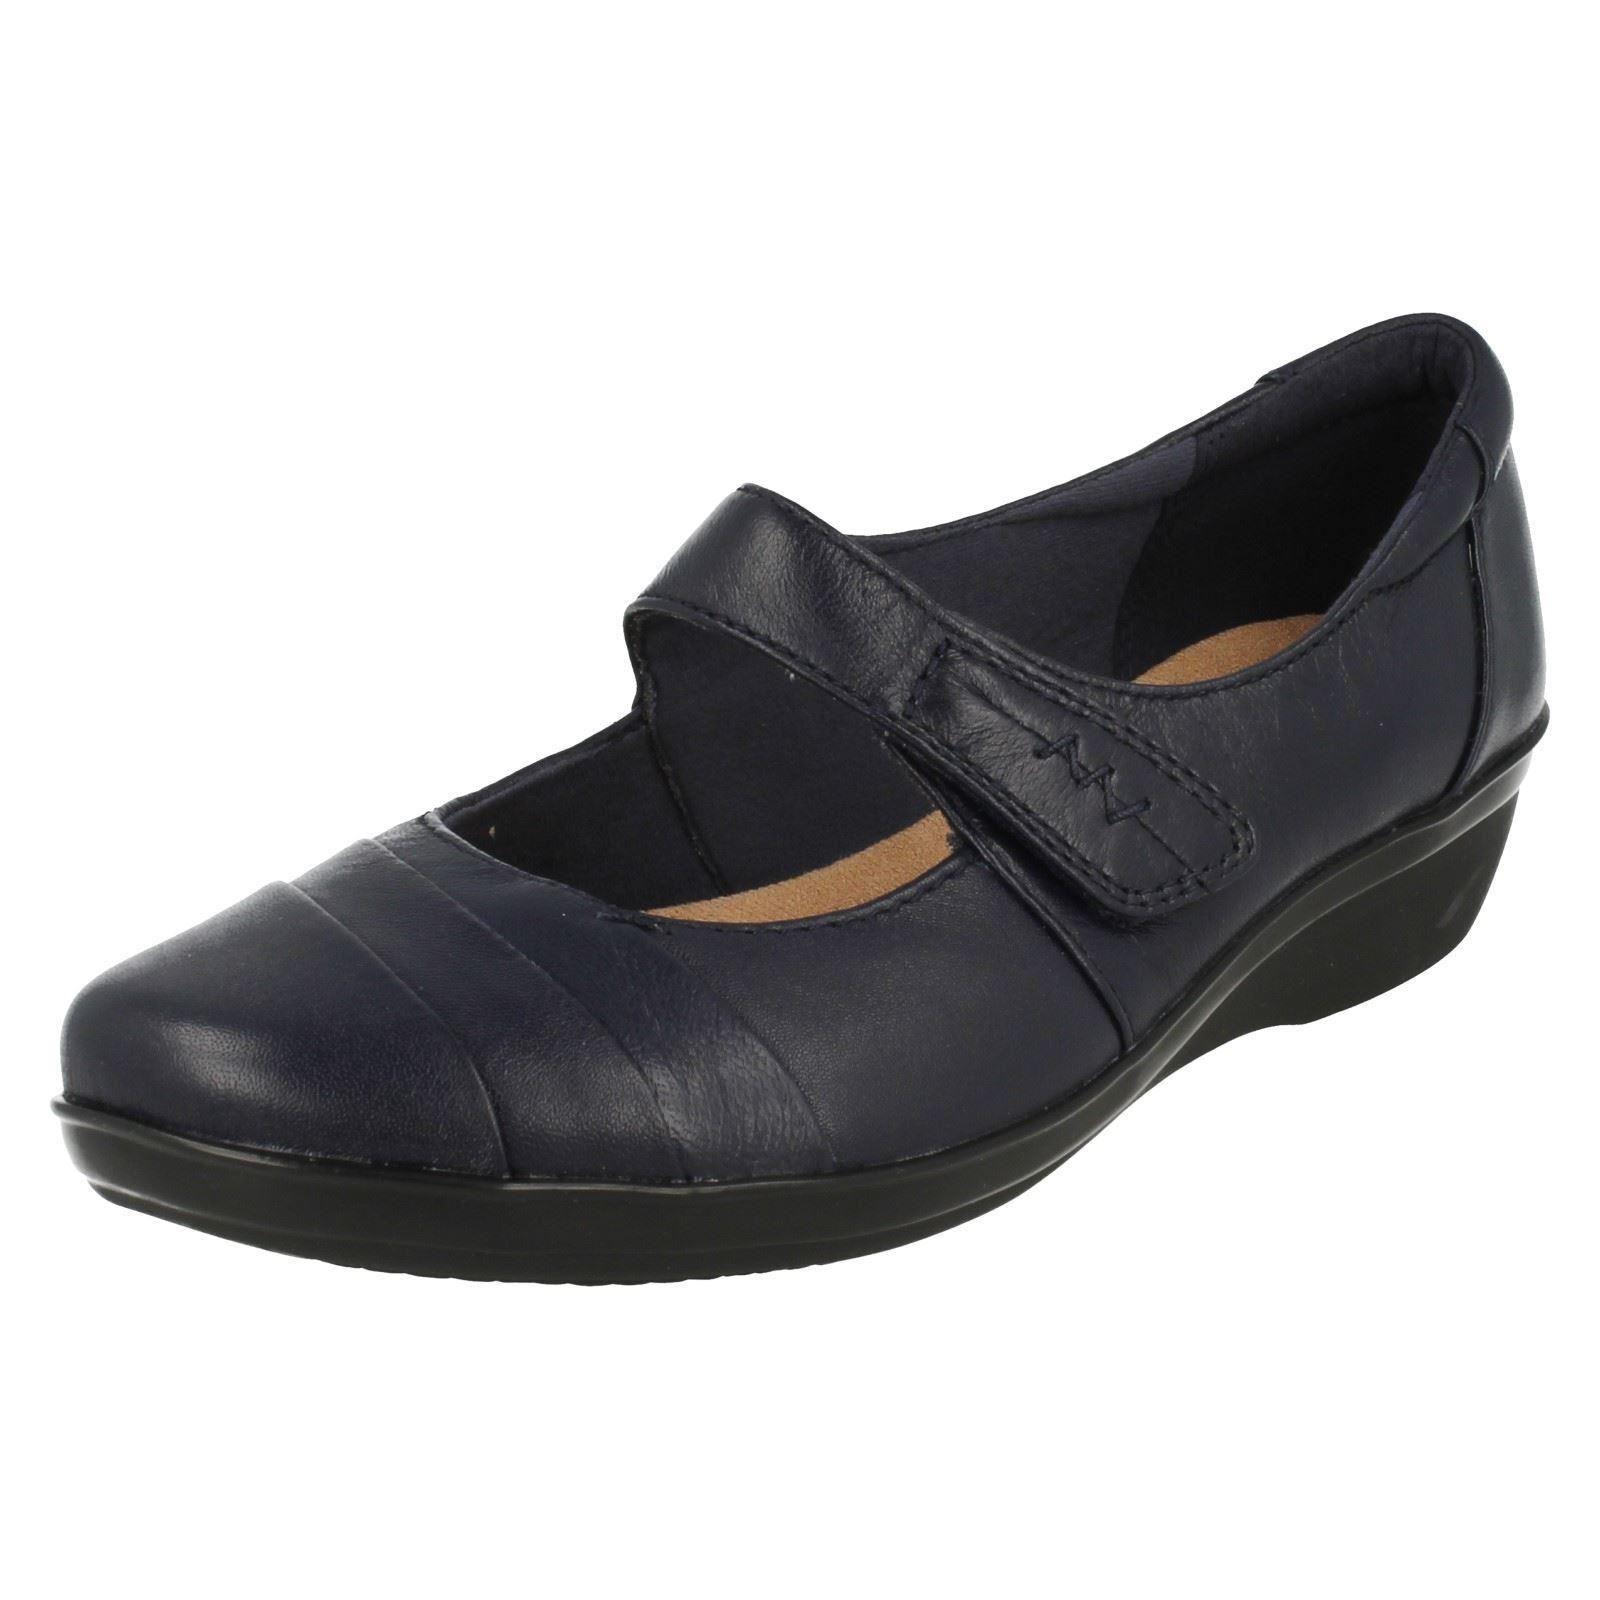 LADIES CLARKS NAVY Schuhe STYLE EVERLAY KENNON